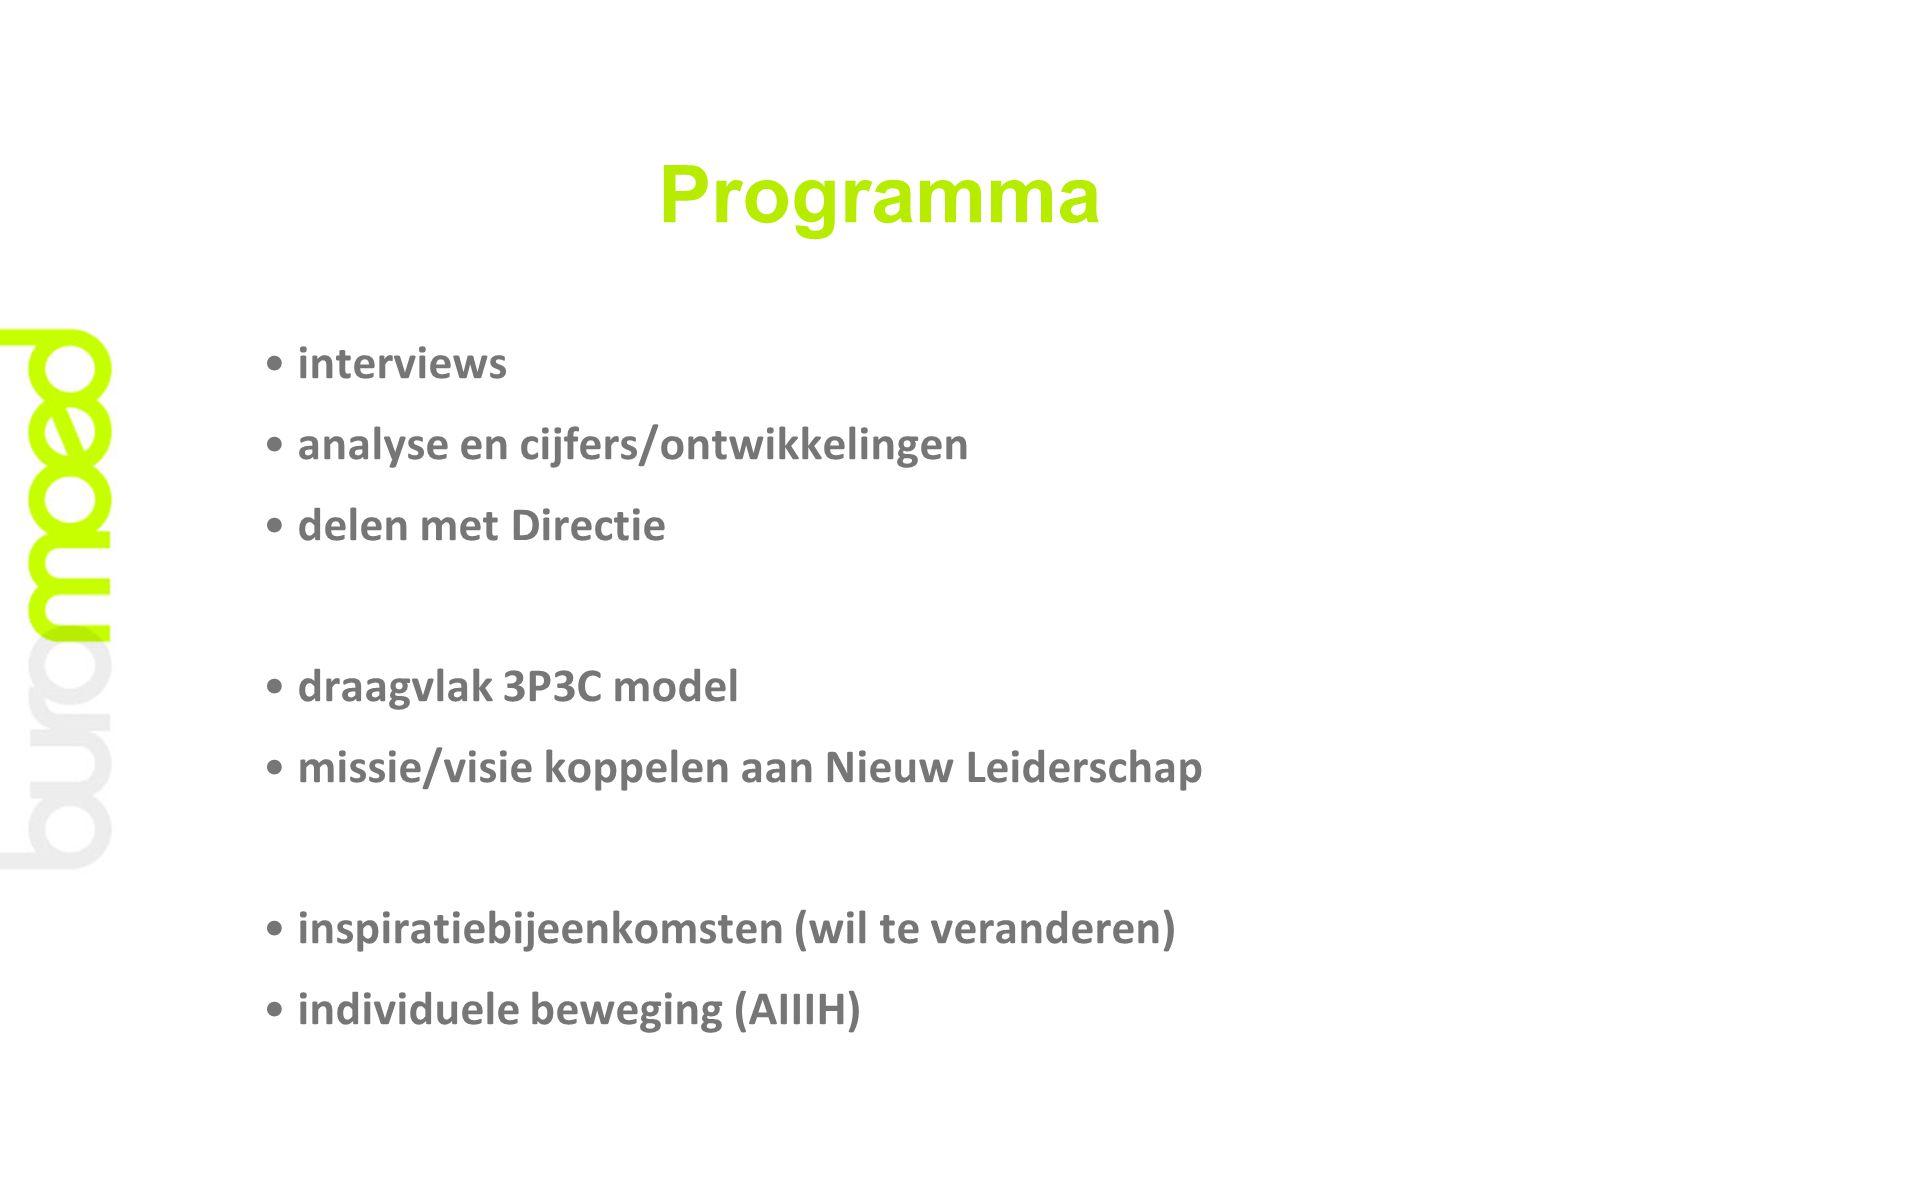 Programma interviews analyse en cijfers/ontwikkelingen